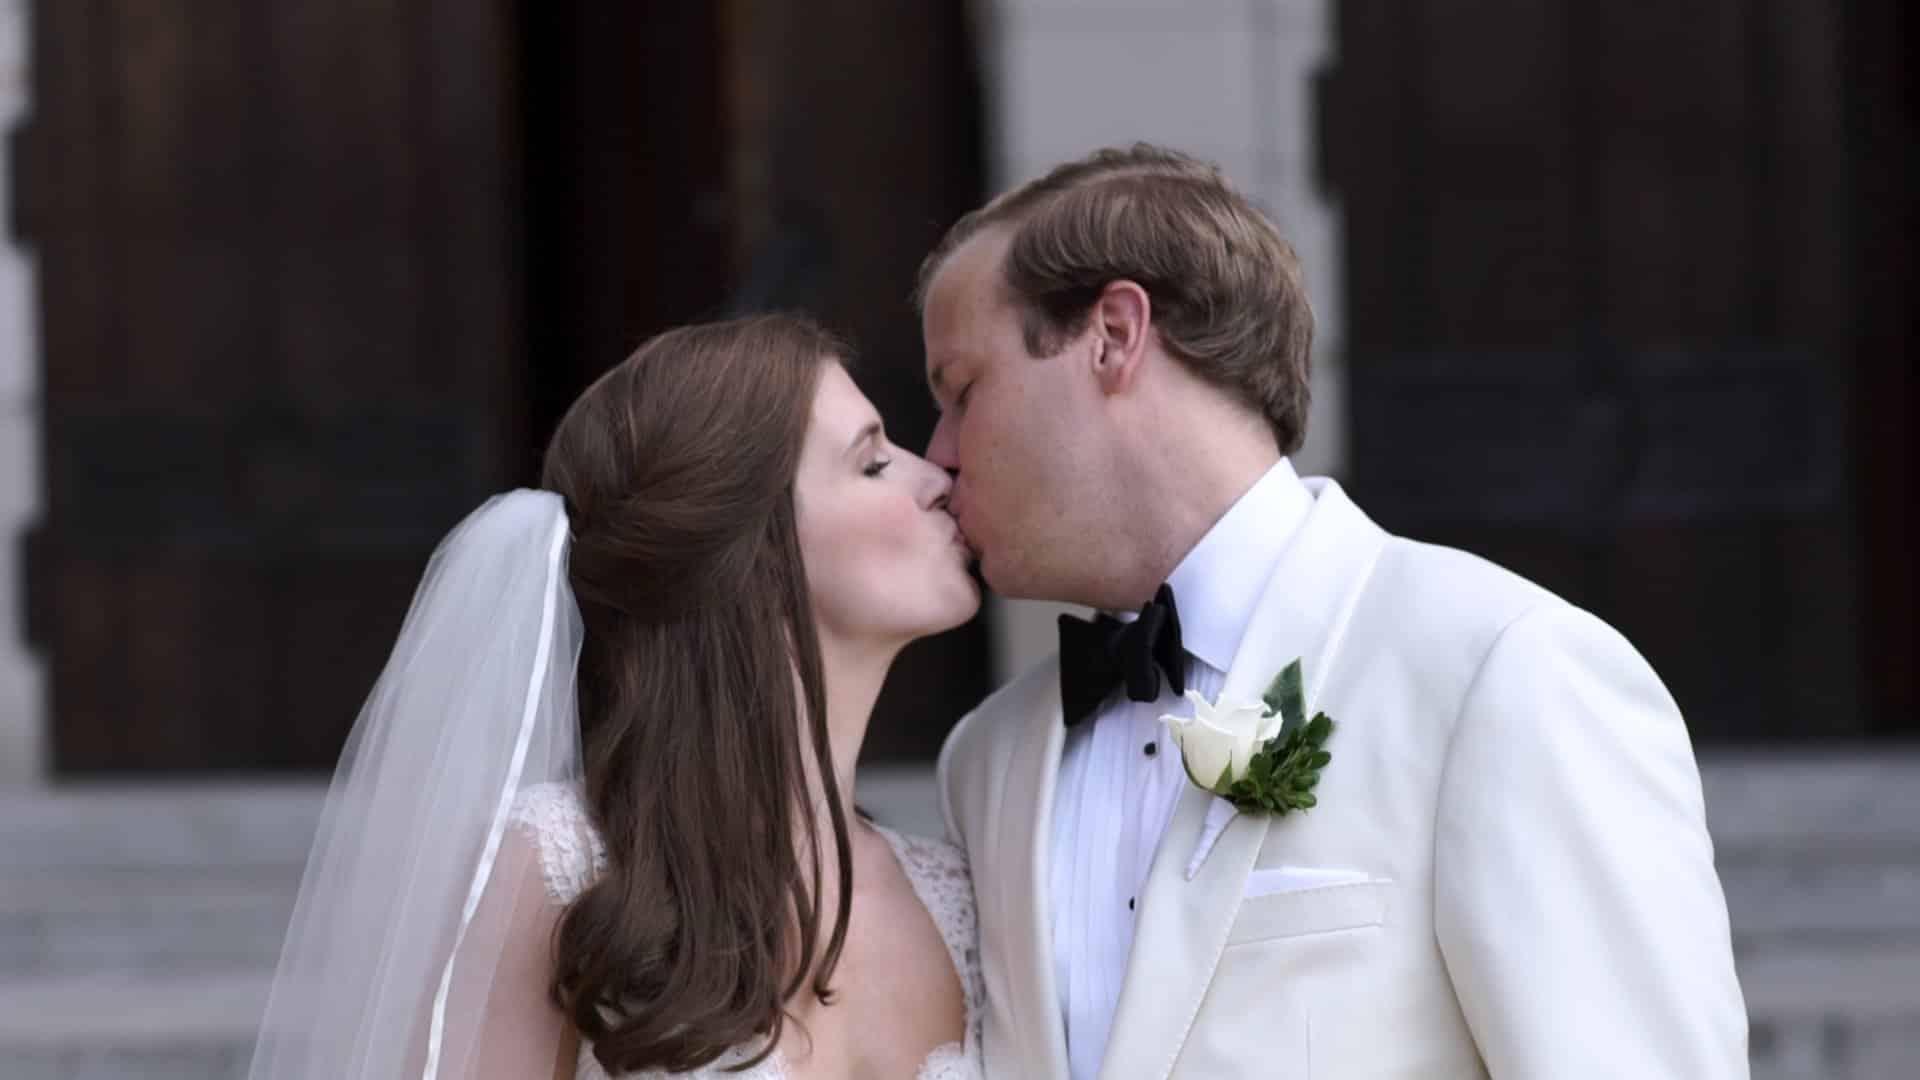 Winston Salem Wedding Video